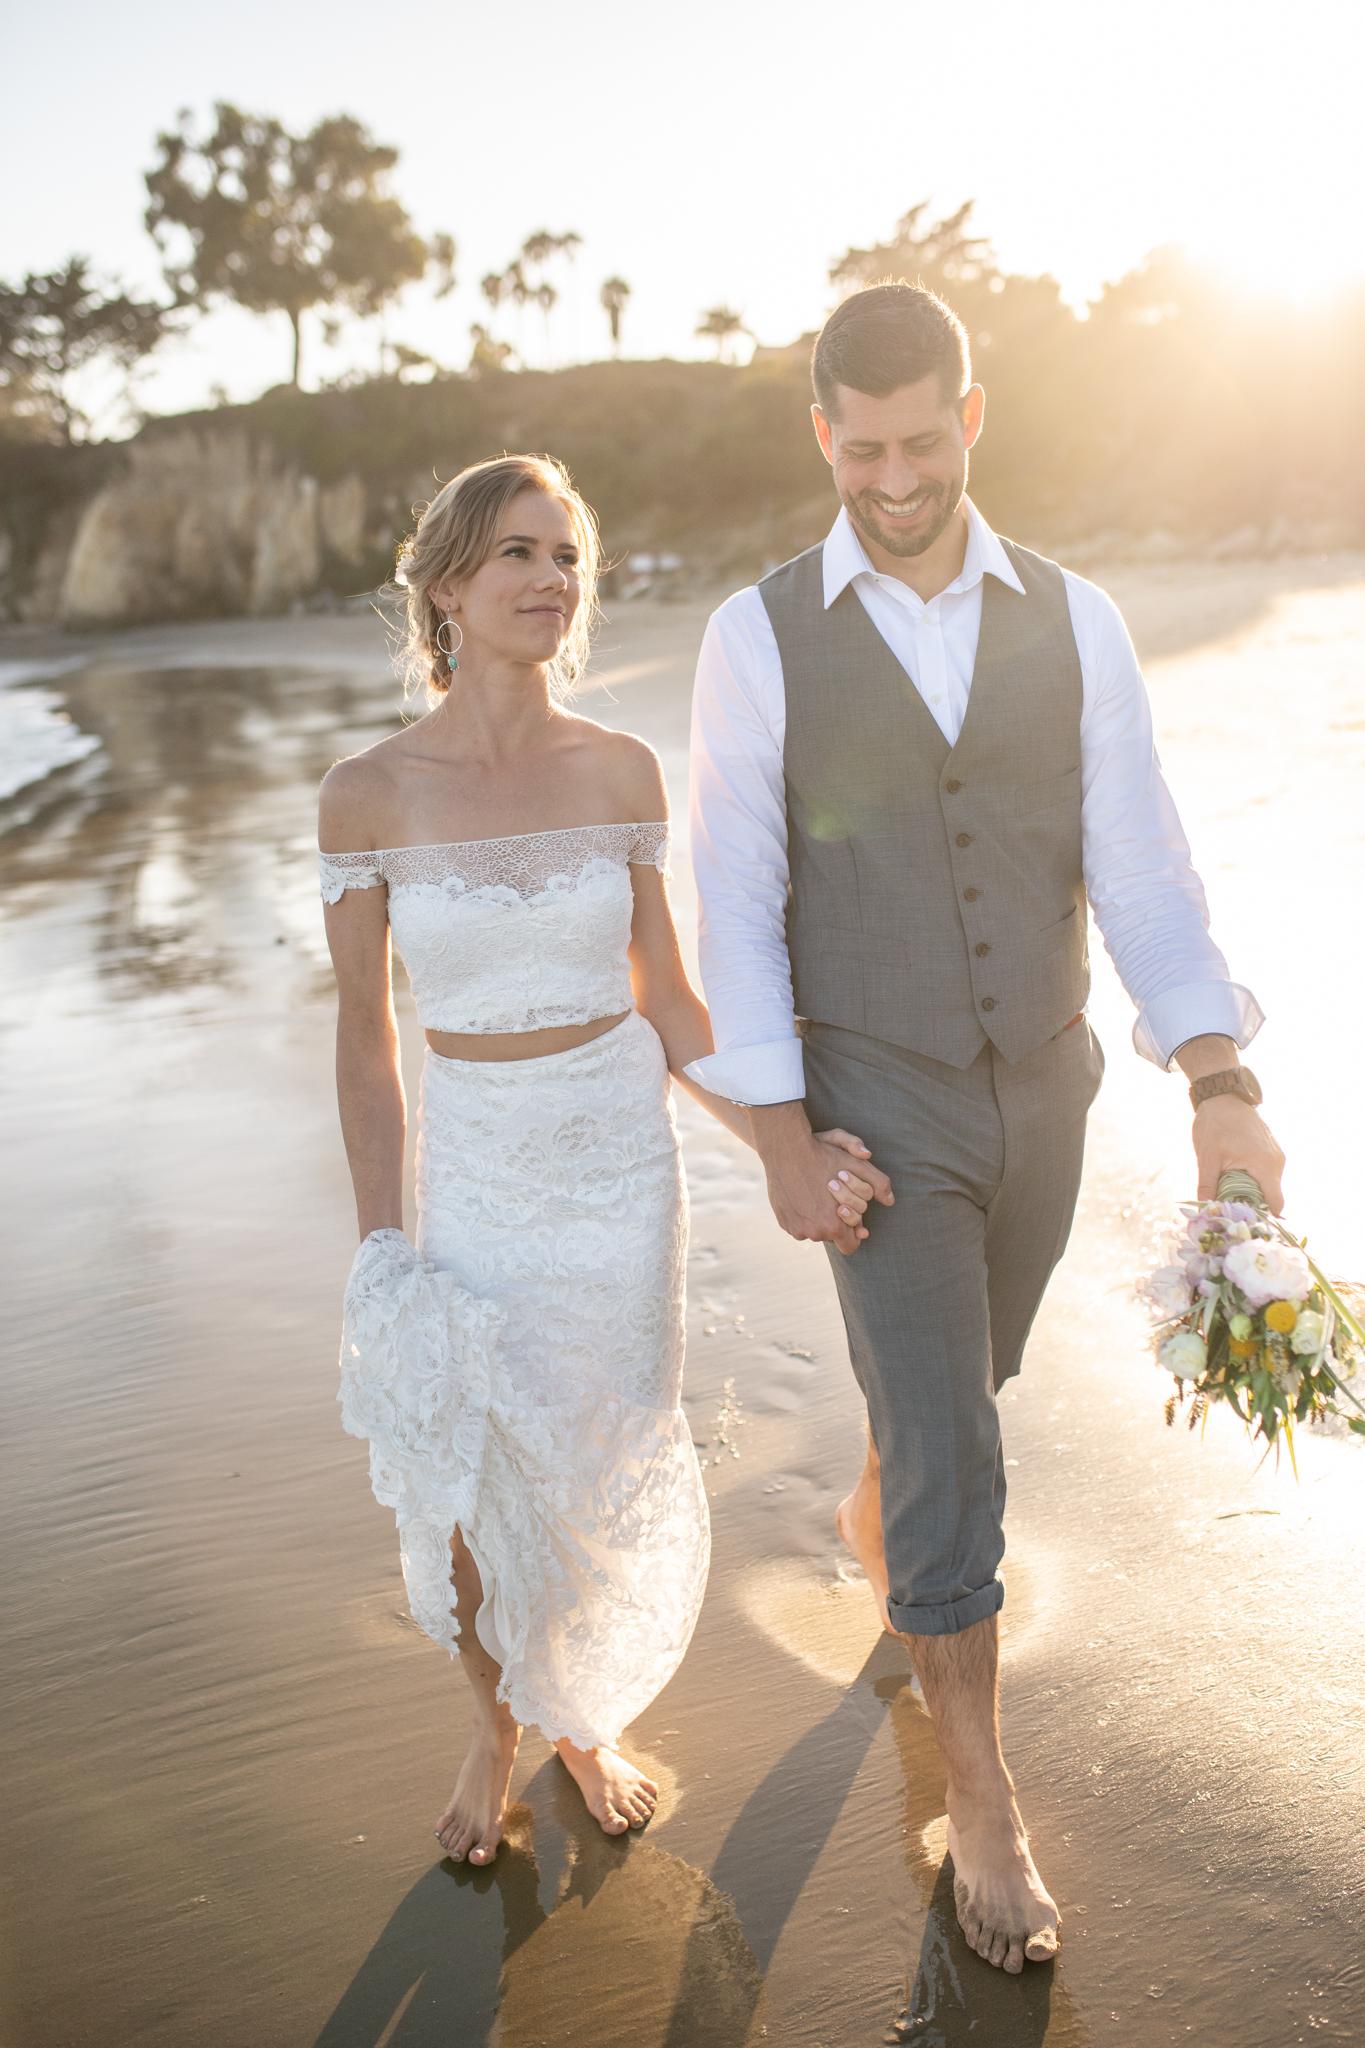 80_PRVW_Jenny_Ken_Wedding_Trevor_Hooper_Photo.jpg